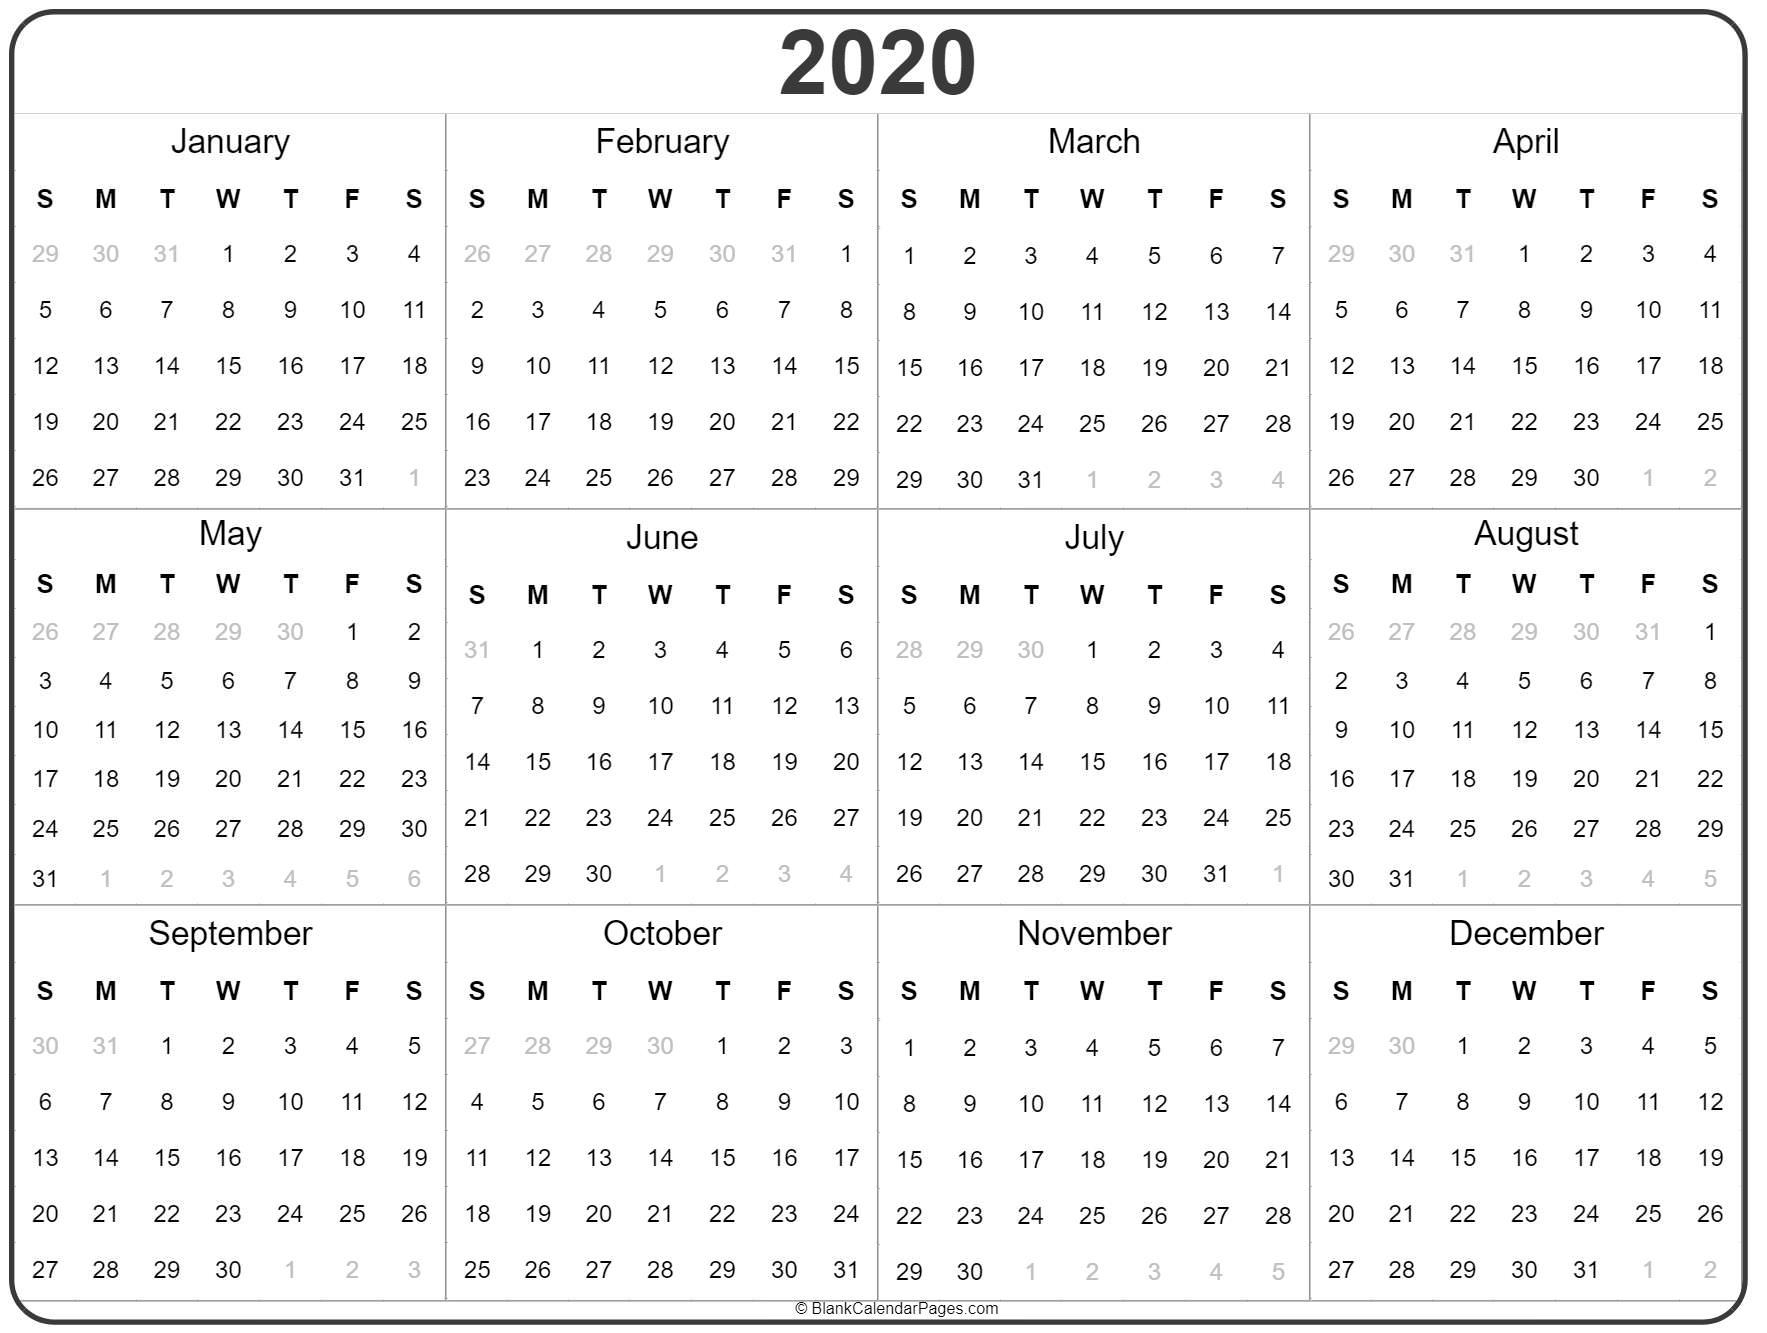 Printable 2020 Year Calendar  Yatay.horizonconsulting.co regarding Printable Calander 2020